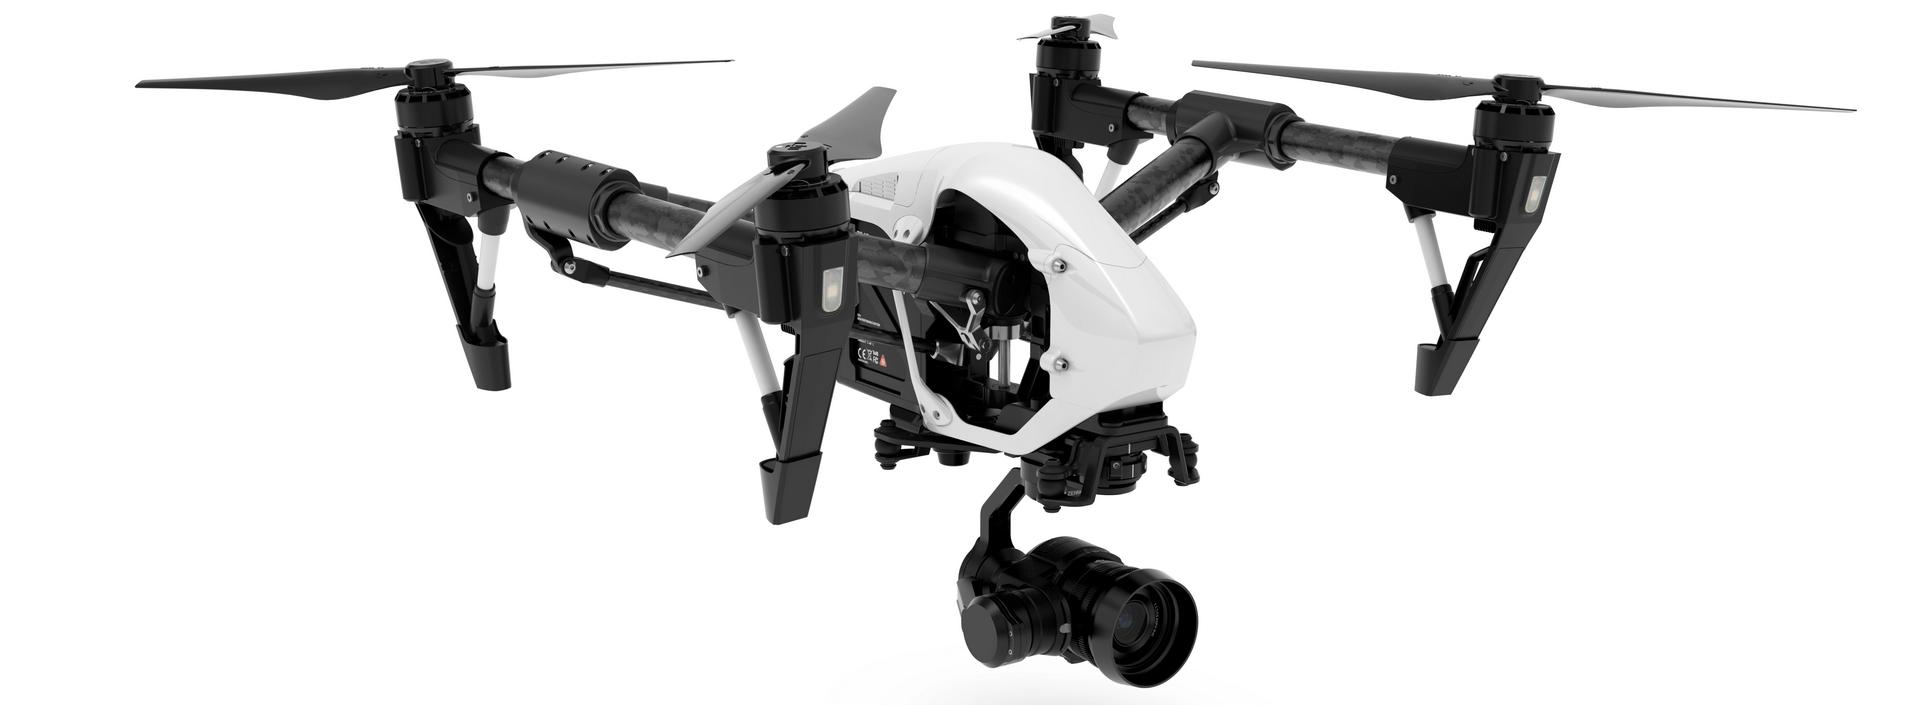 Quadcopter с камерой DJI Inspire 1 PRO